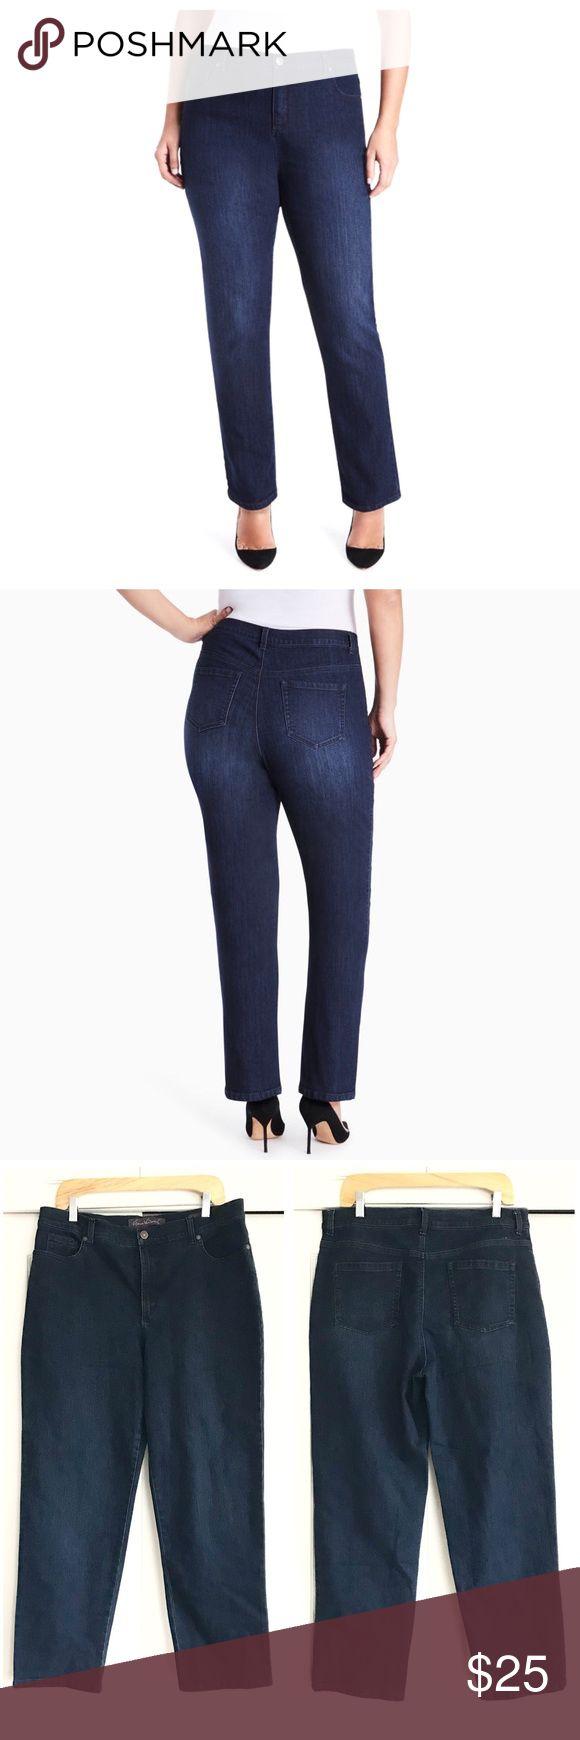 I just added this listing on Poshmark: Gloria Vanderbilt Amanda Jeans. #shopmycloset #poshmark #fashion #shopping #style #forsale #Gloria Vanderbilt #Denim